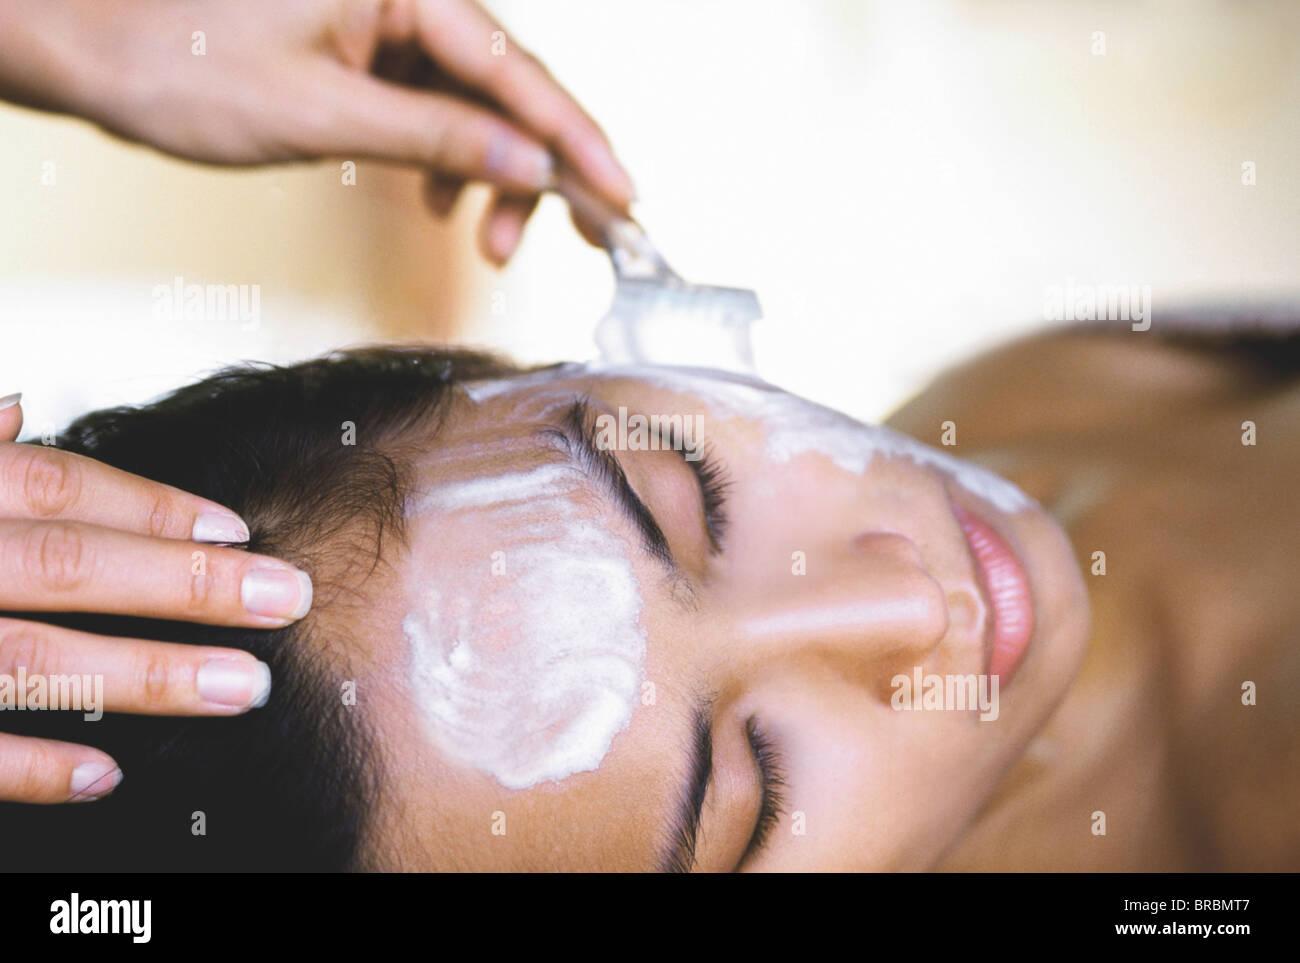 Woman having a facial, Kirana Spa, Indonesia Stock Photo